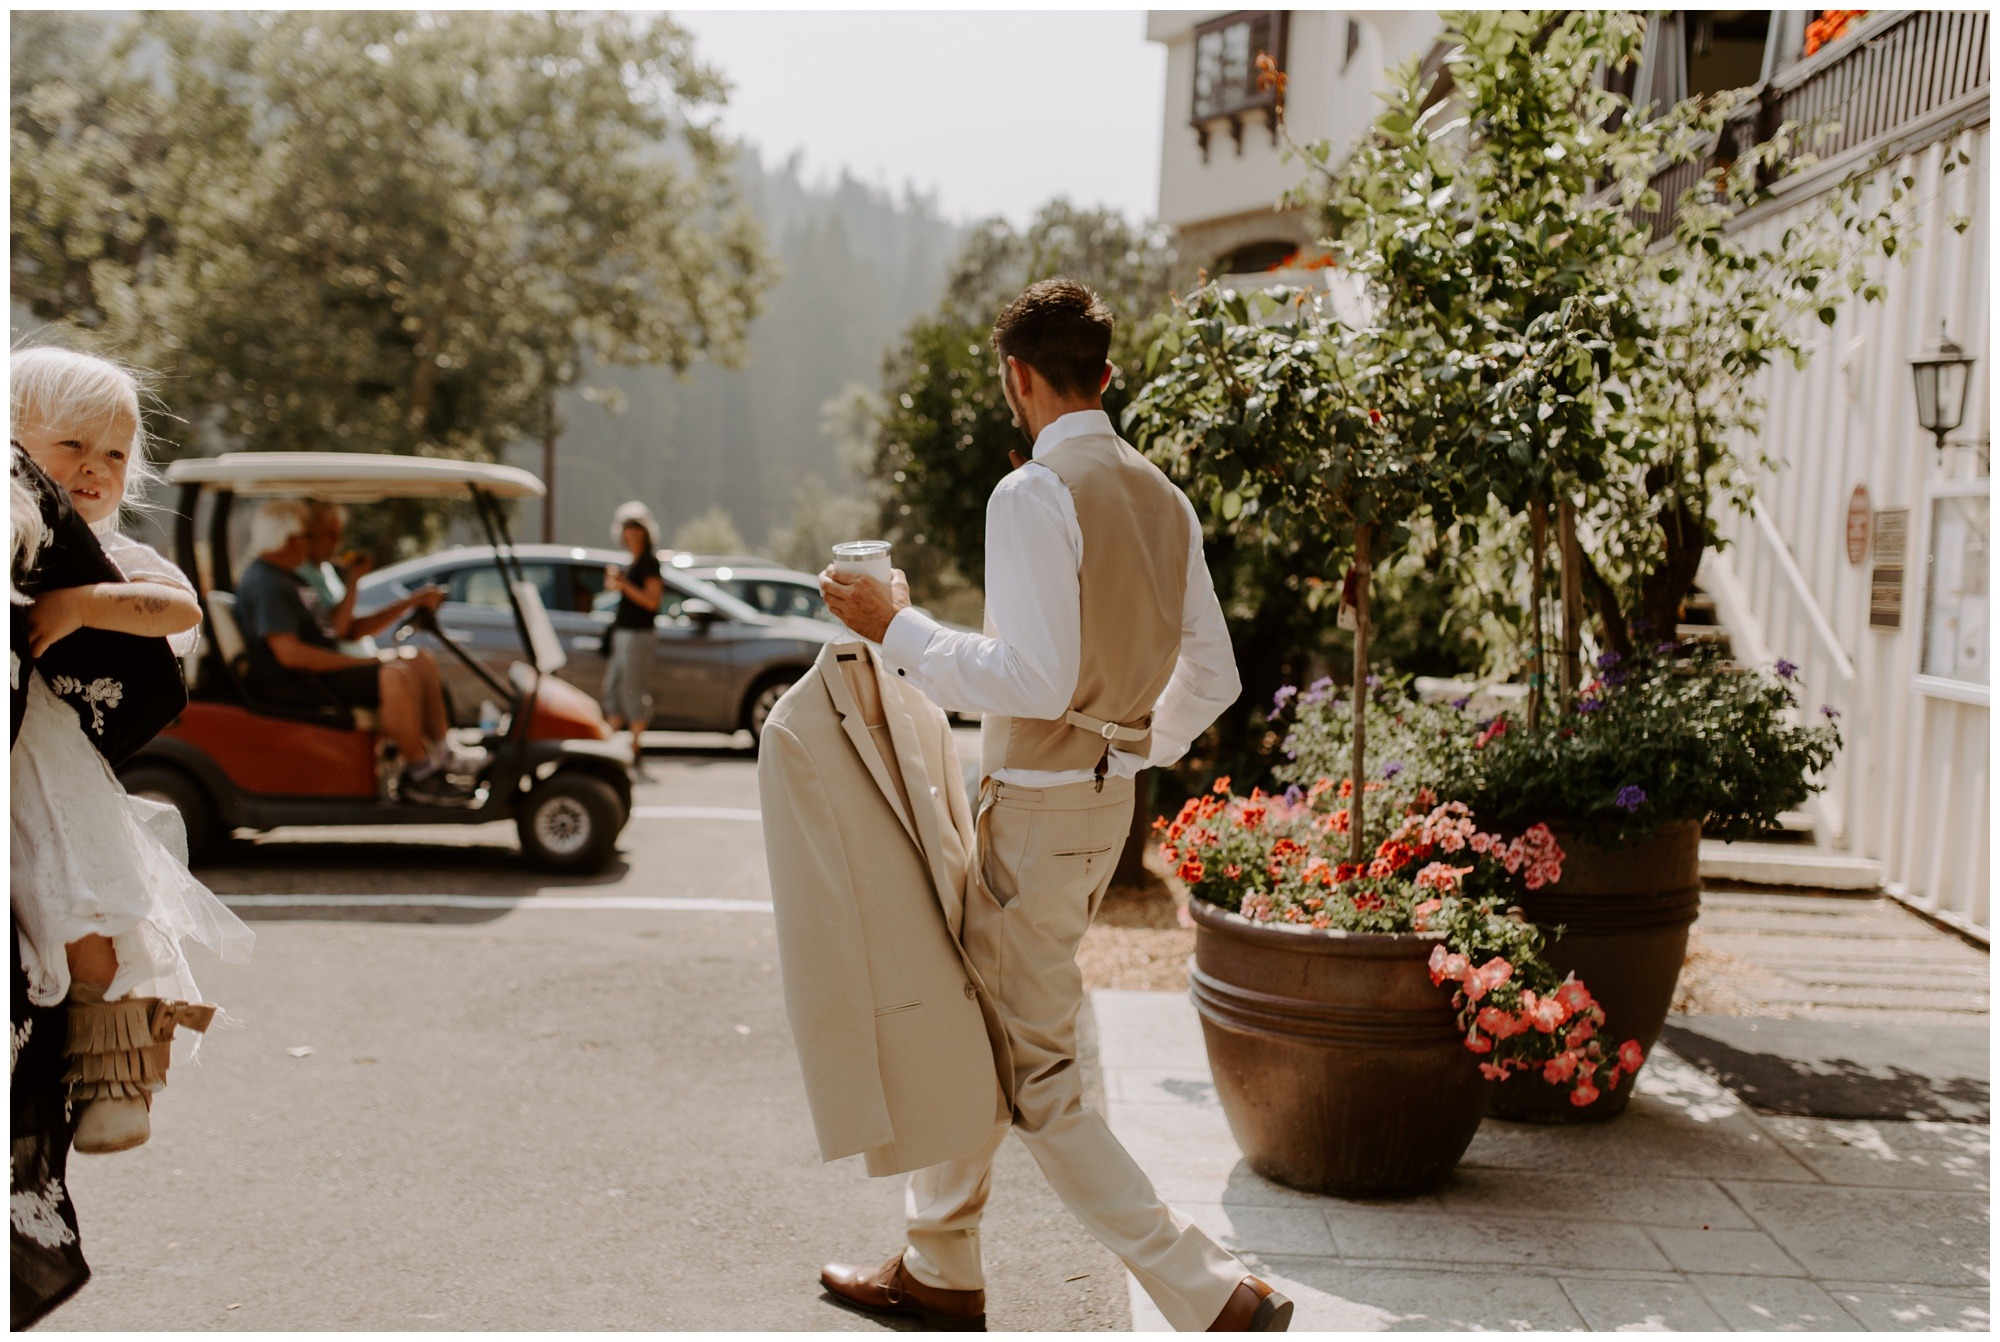 Redwood Festival Wedding Humbolt California - Jessica Heron Images_0009.jpg